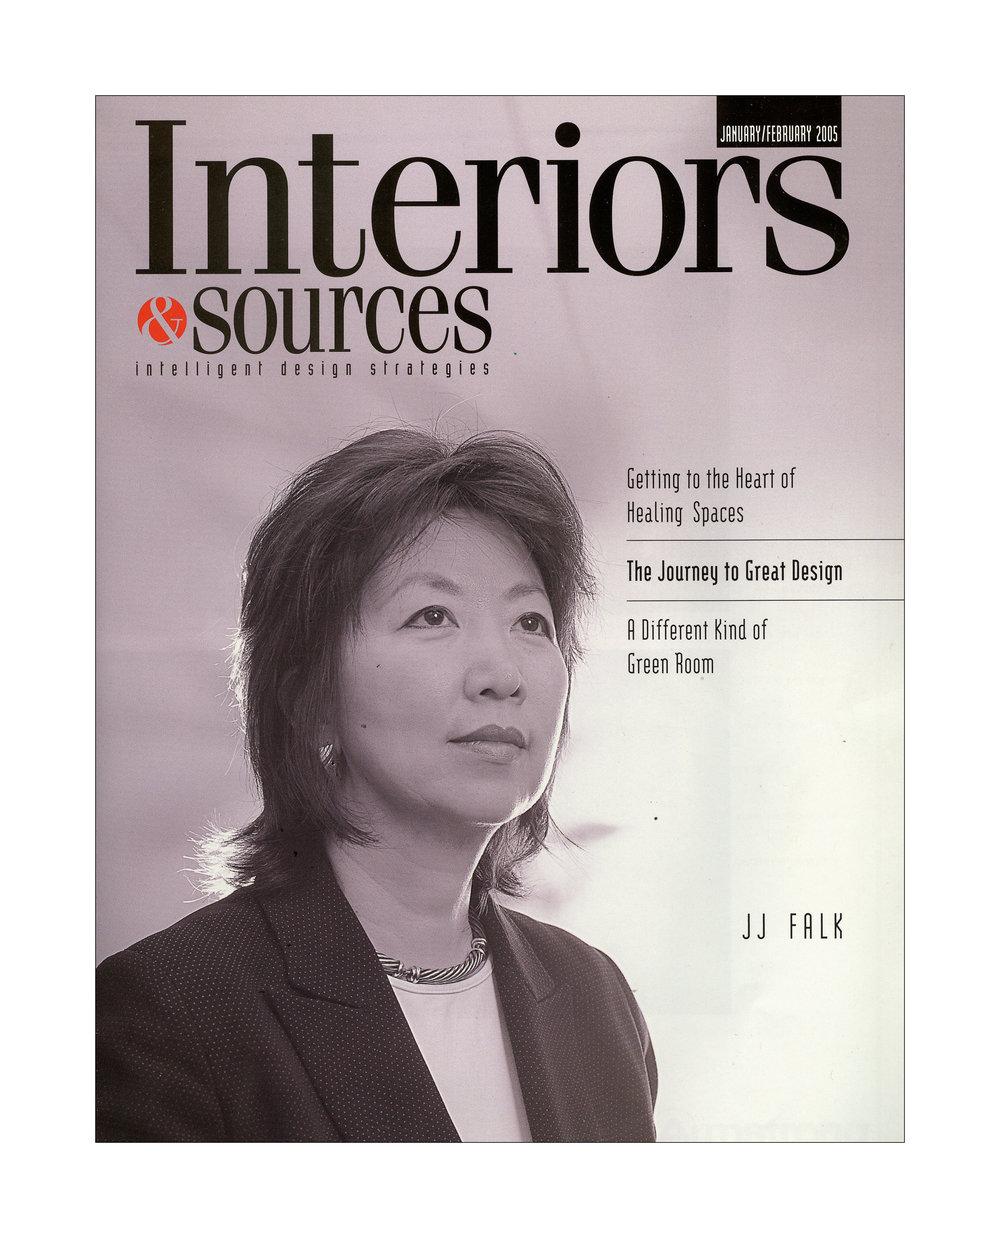 2005 Interiors Sources